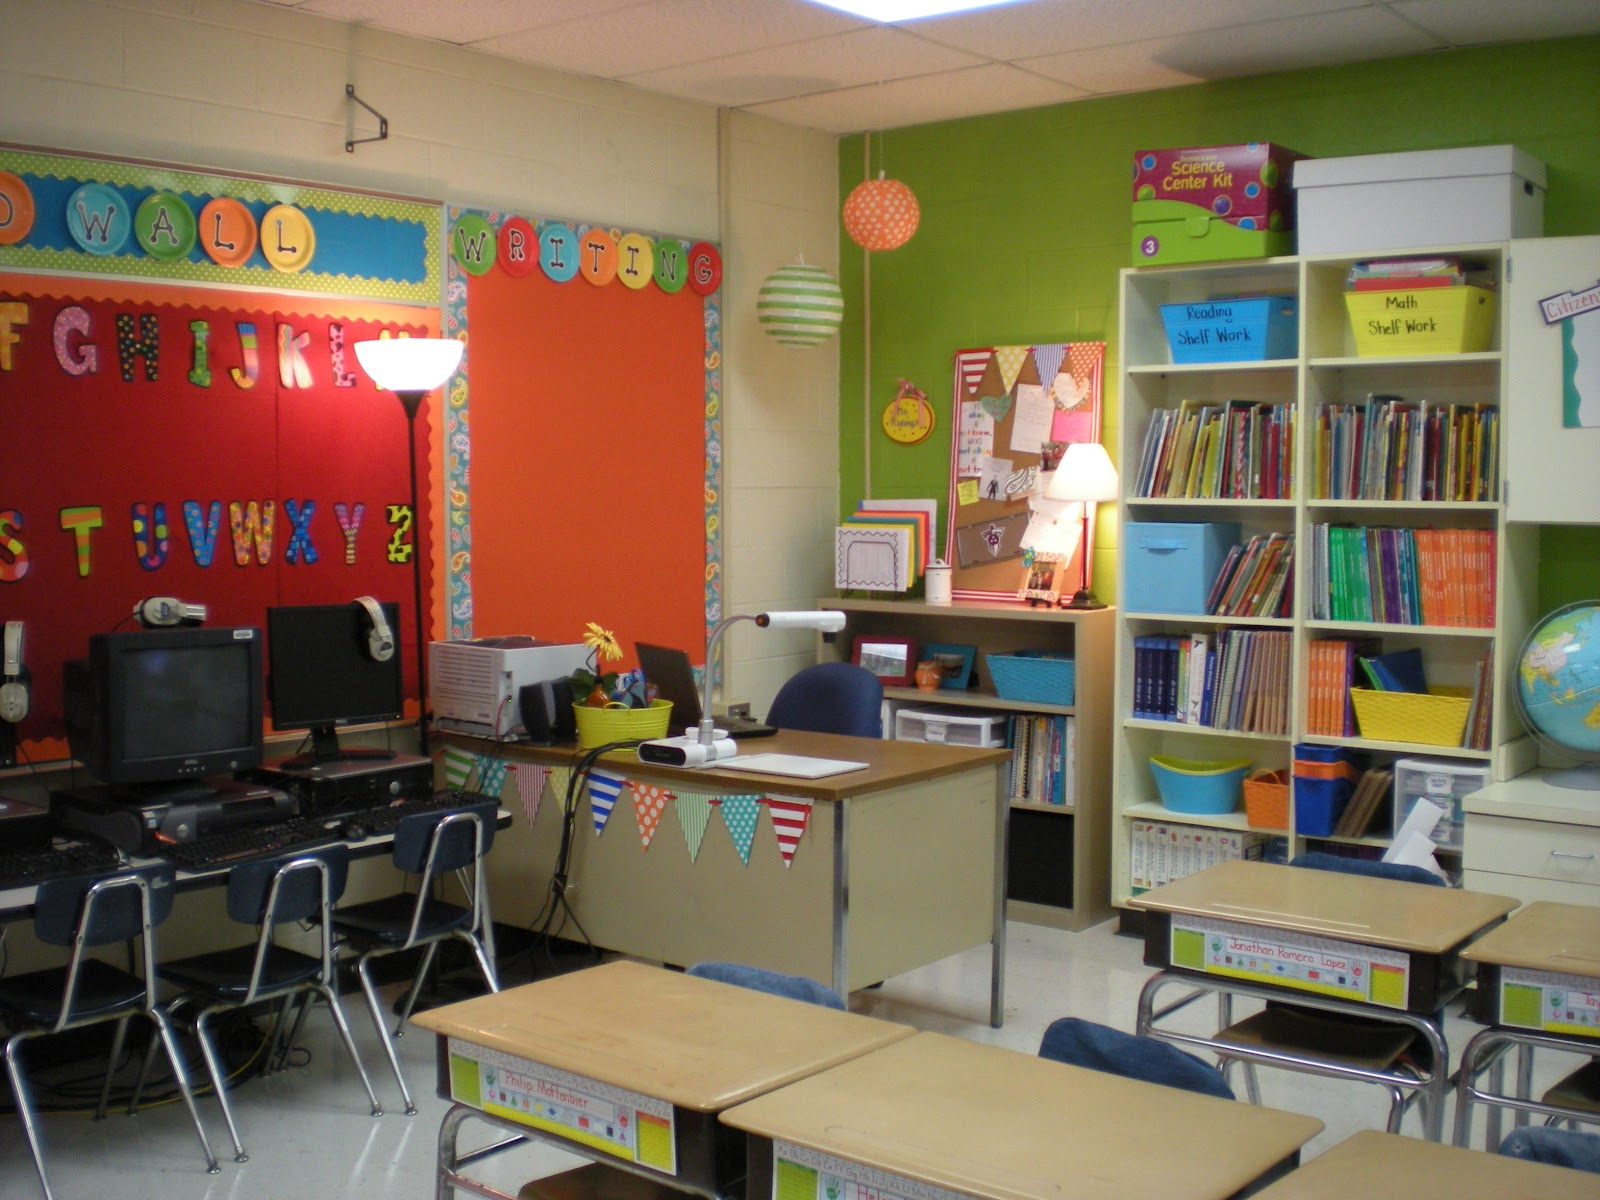 Classroom Wall Ideas : The good life july